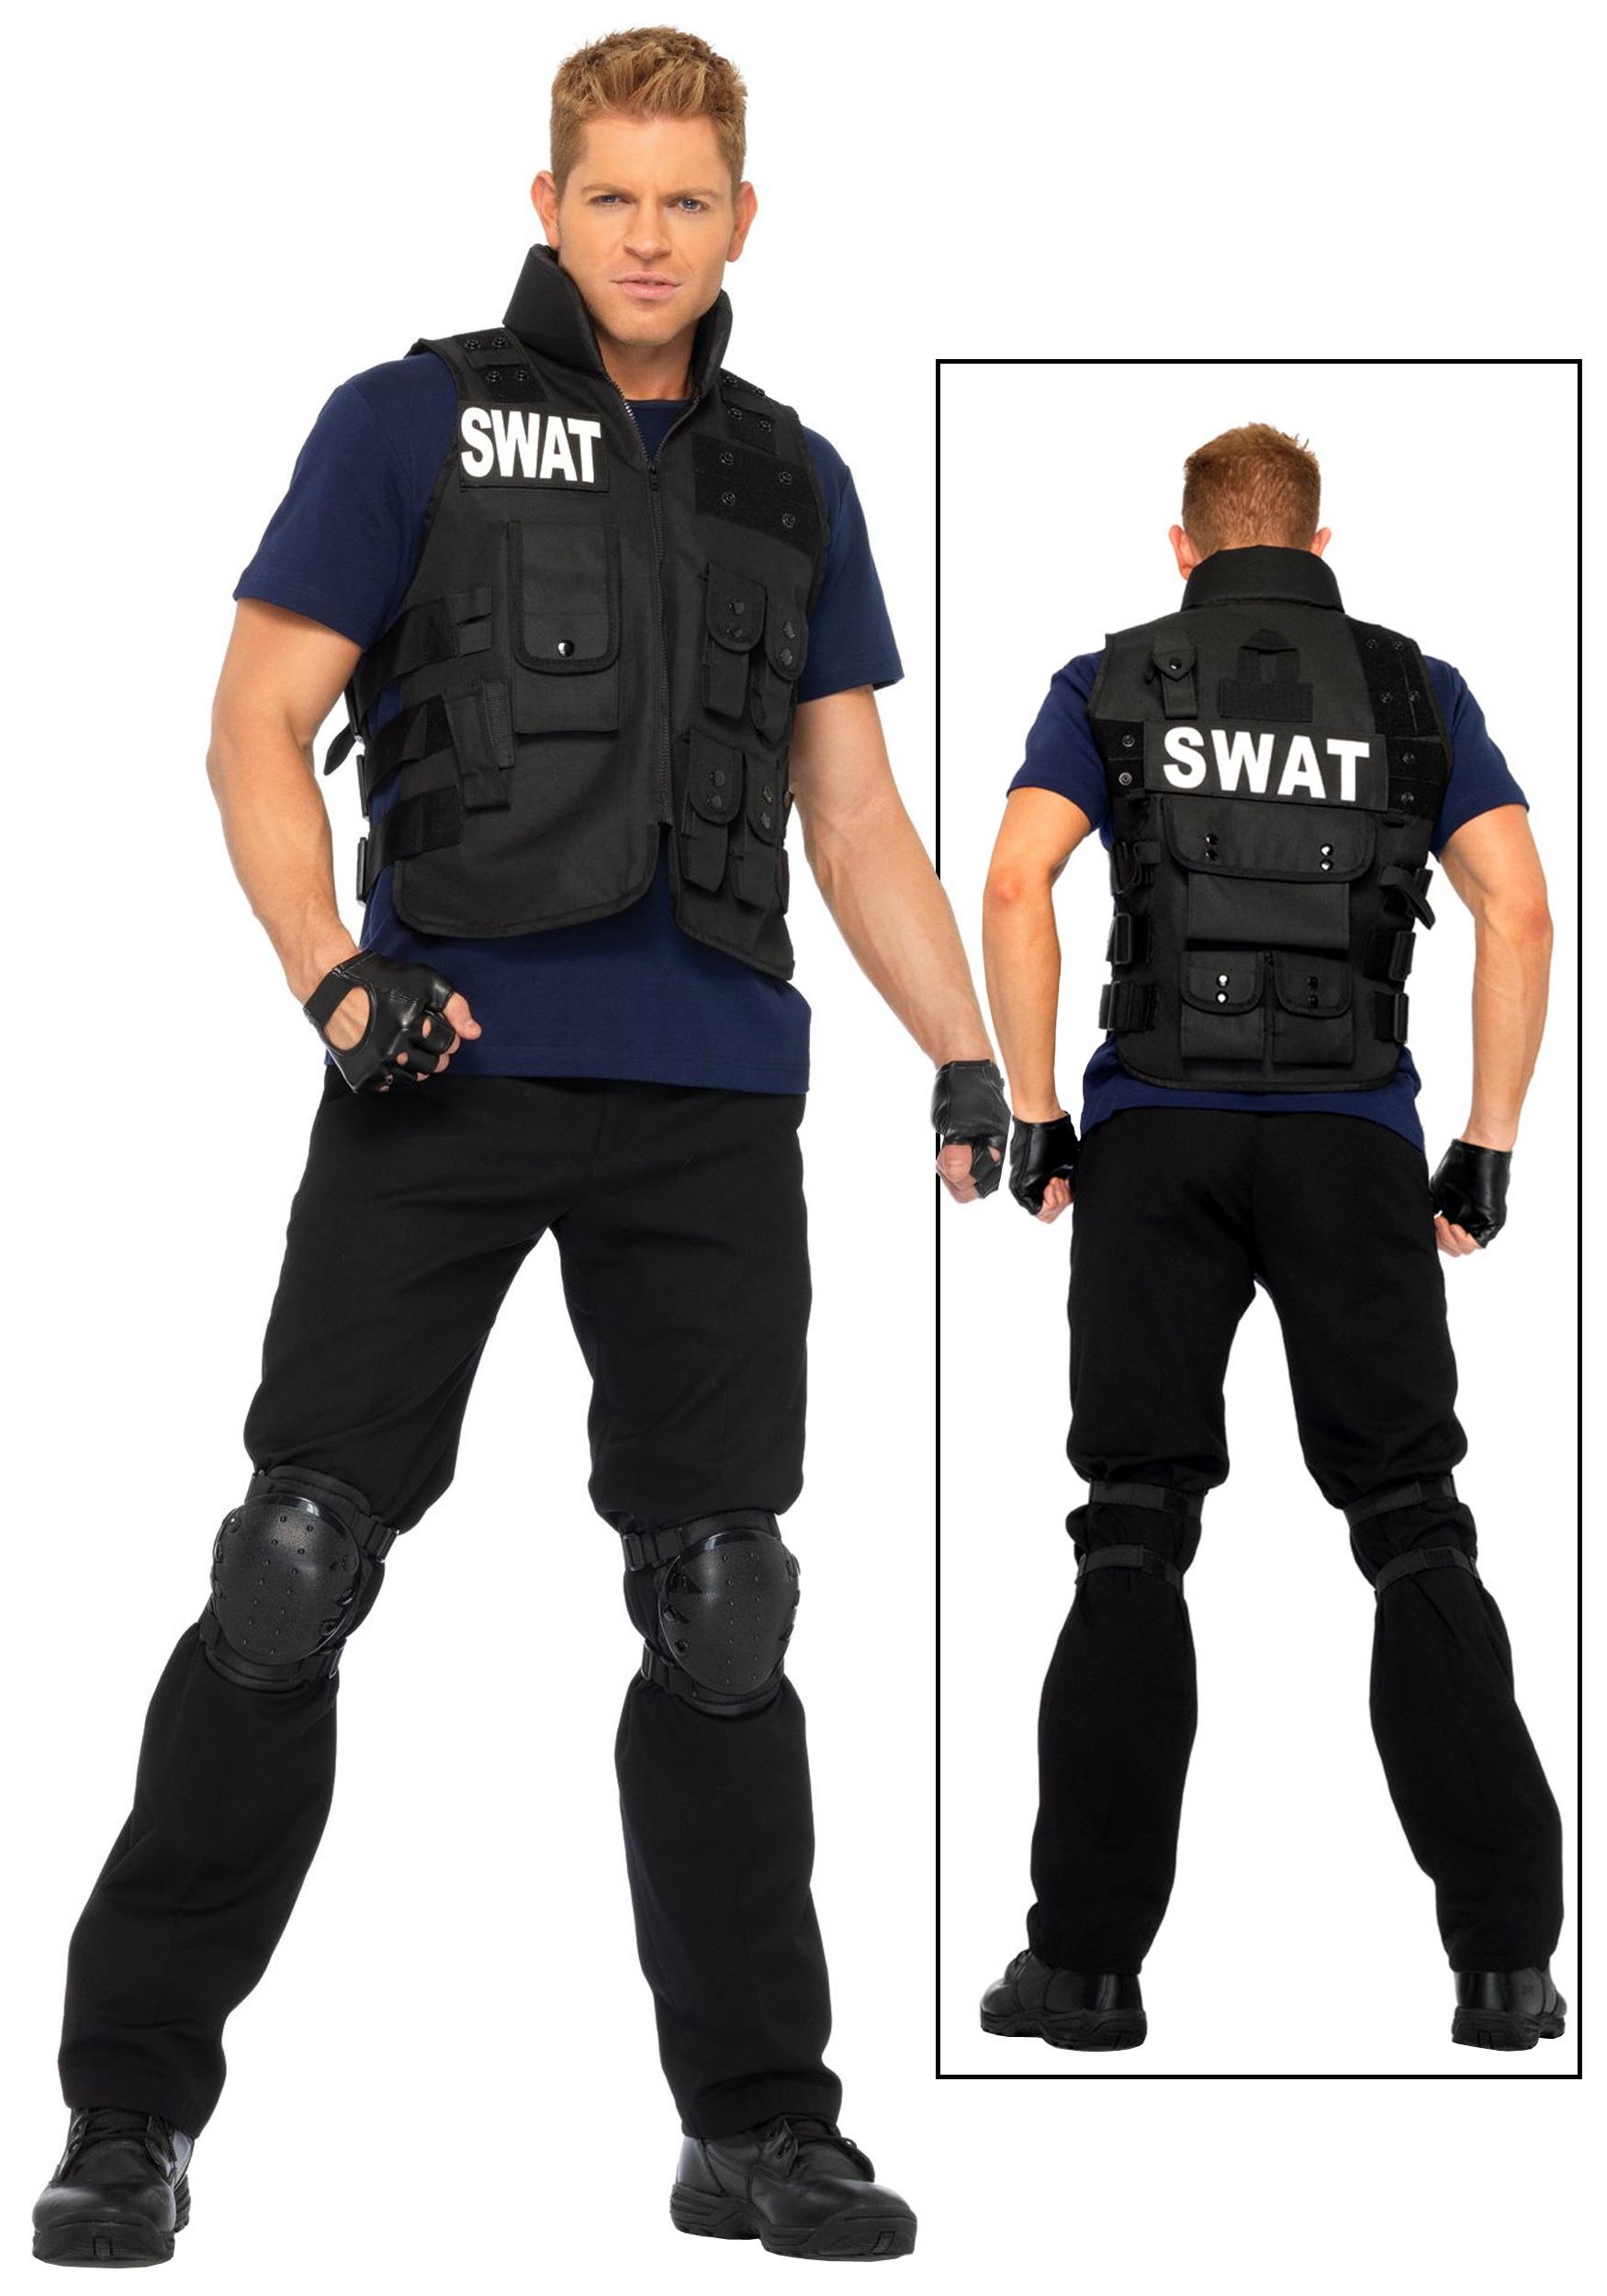 66ee8bd5301 Cop Costumes For Boys & Plus Mens SWAT Team Costume Sc 1 St ...